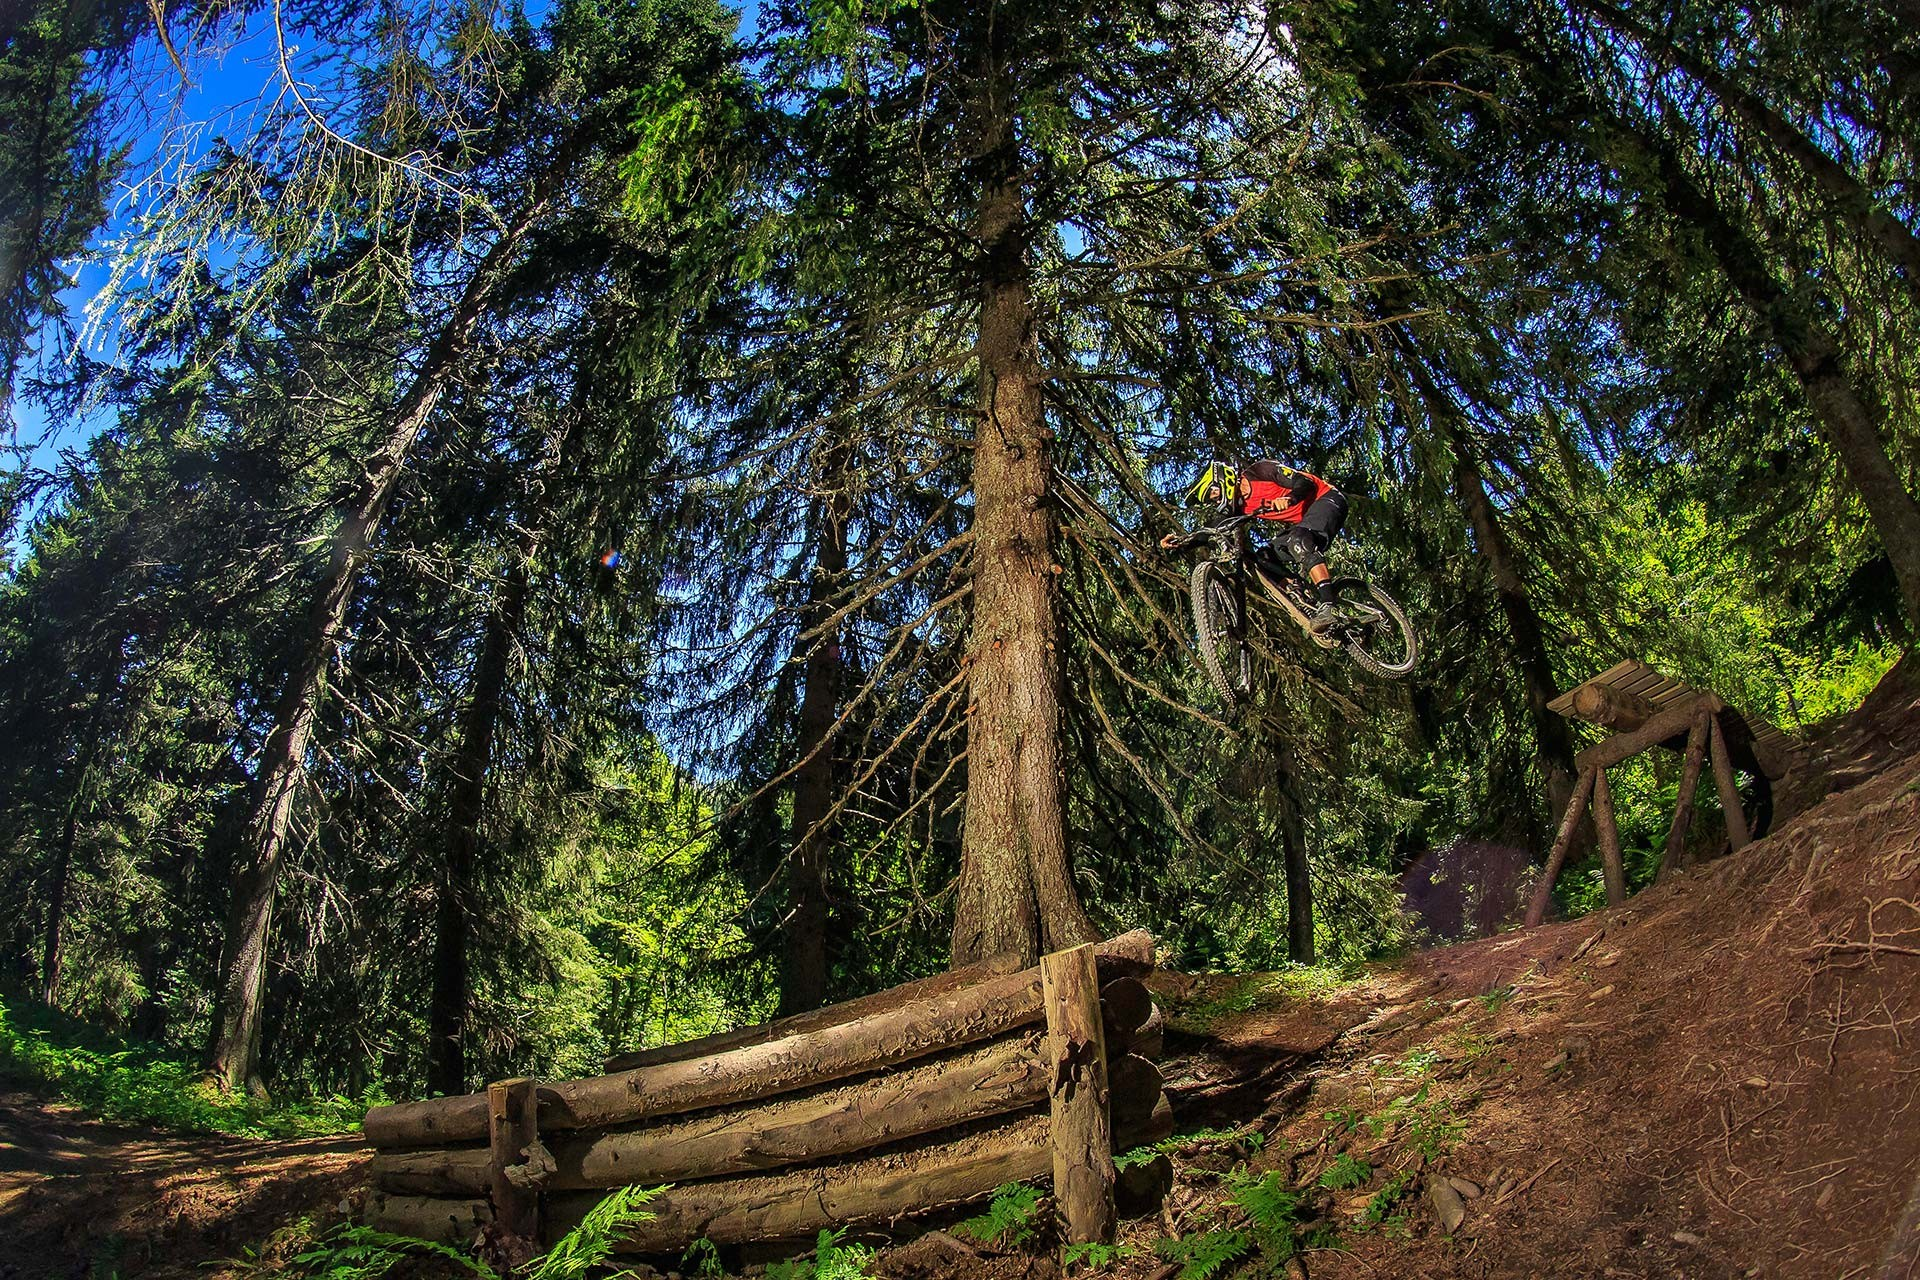 Bike Park videos